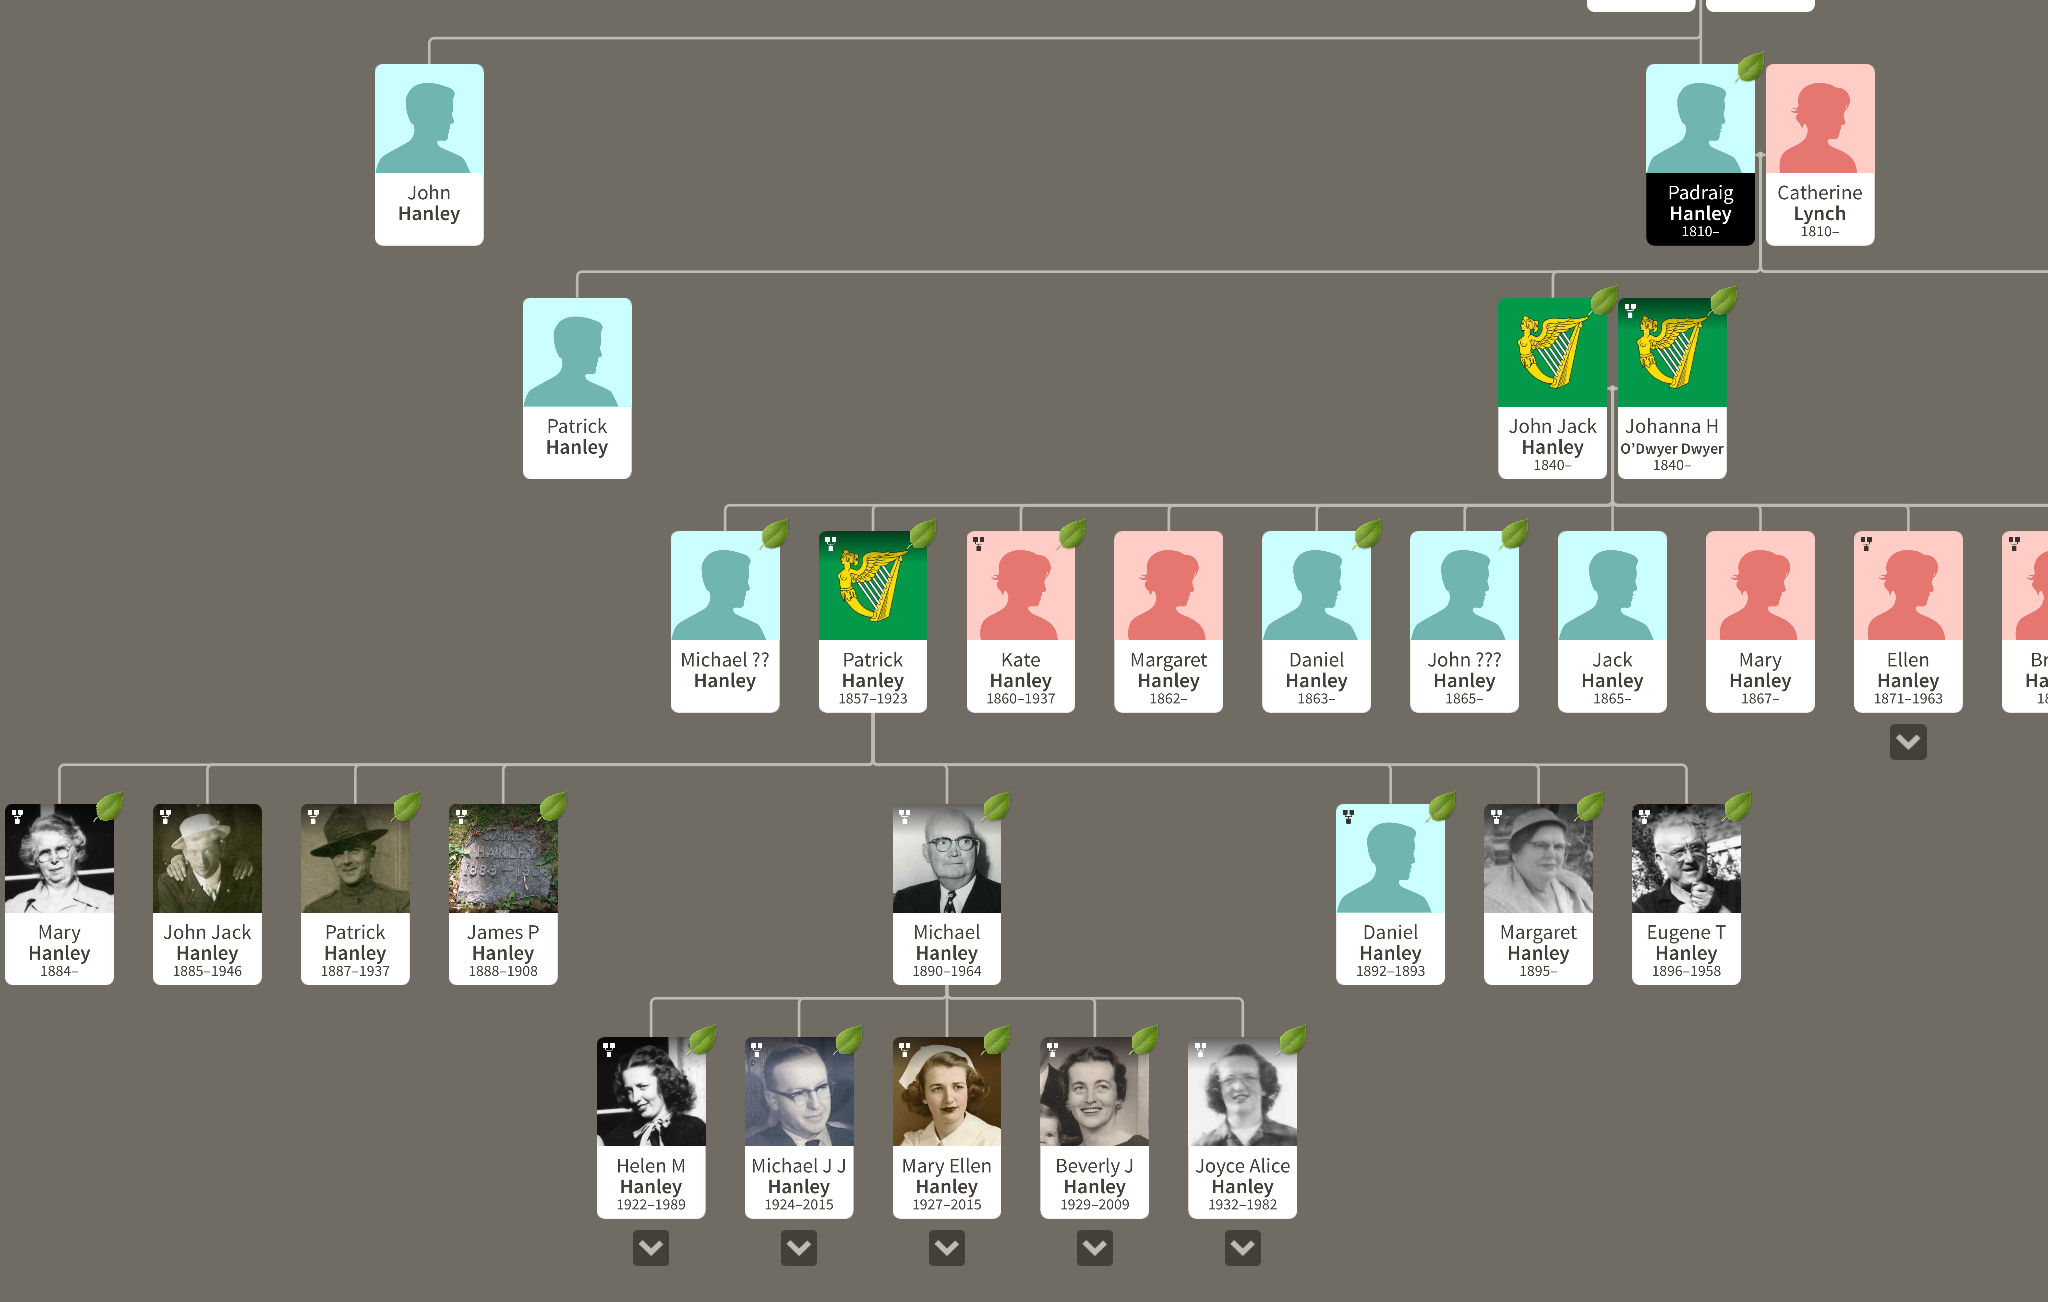 Five Generations of Hanley Men: Padraig > John Jack > Patrick > Michael John > Michael John Jr.